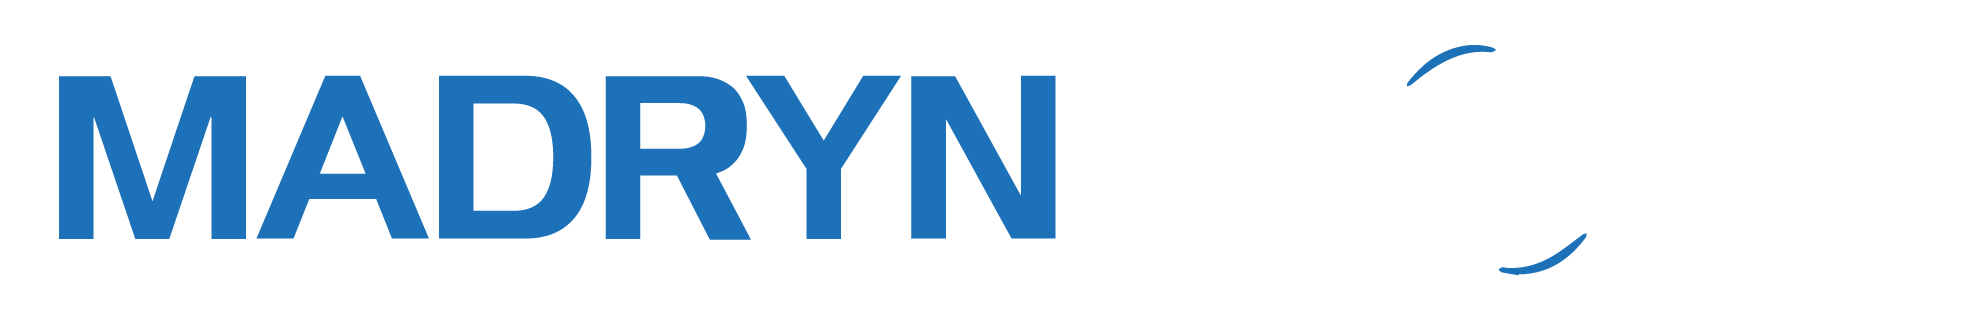 MadrynAhora